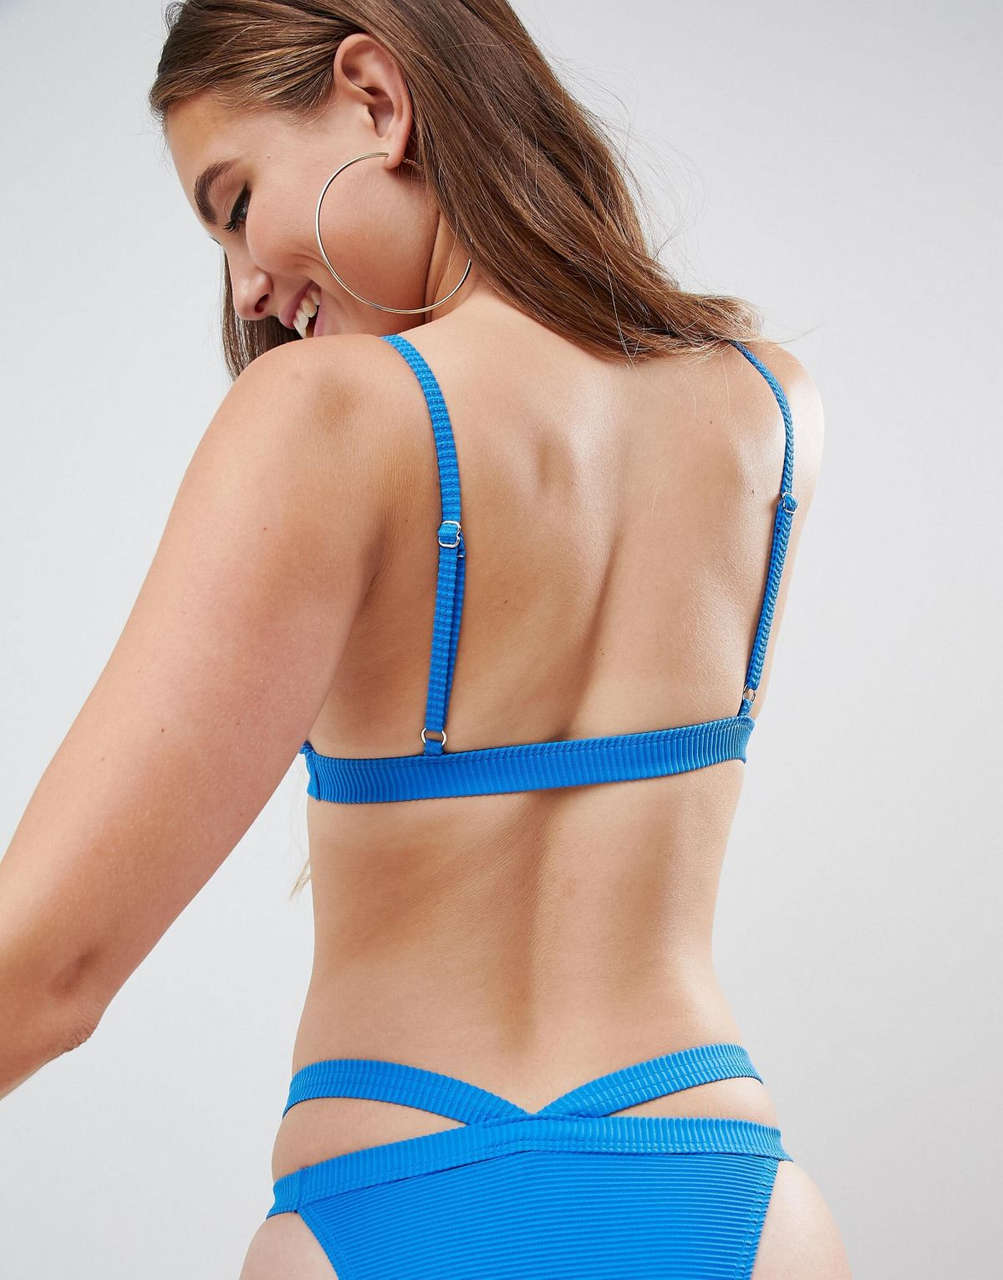 Ida Zeile For Asos Swimwear July